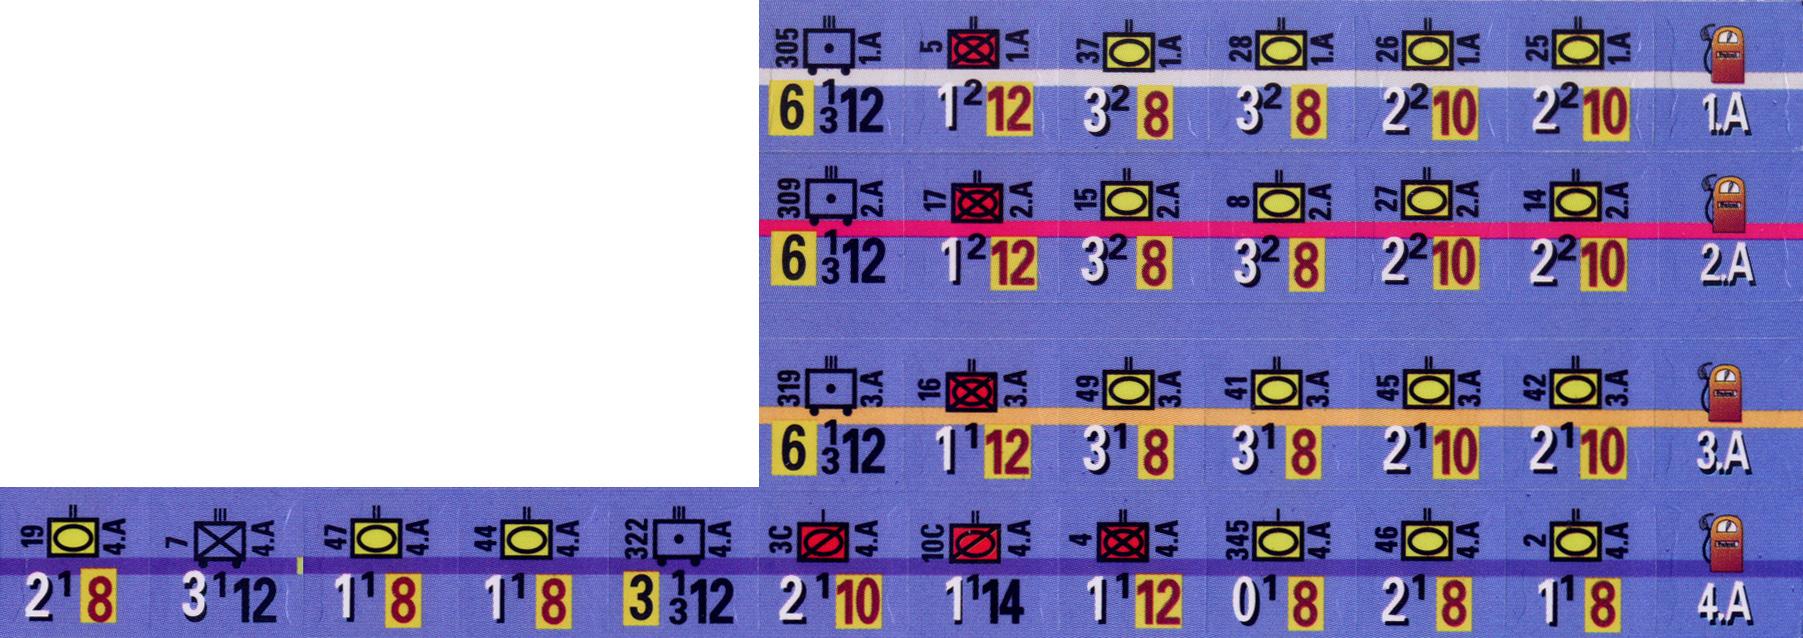 unit9866.jpg